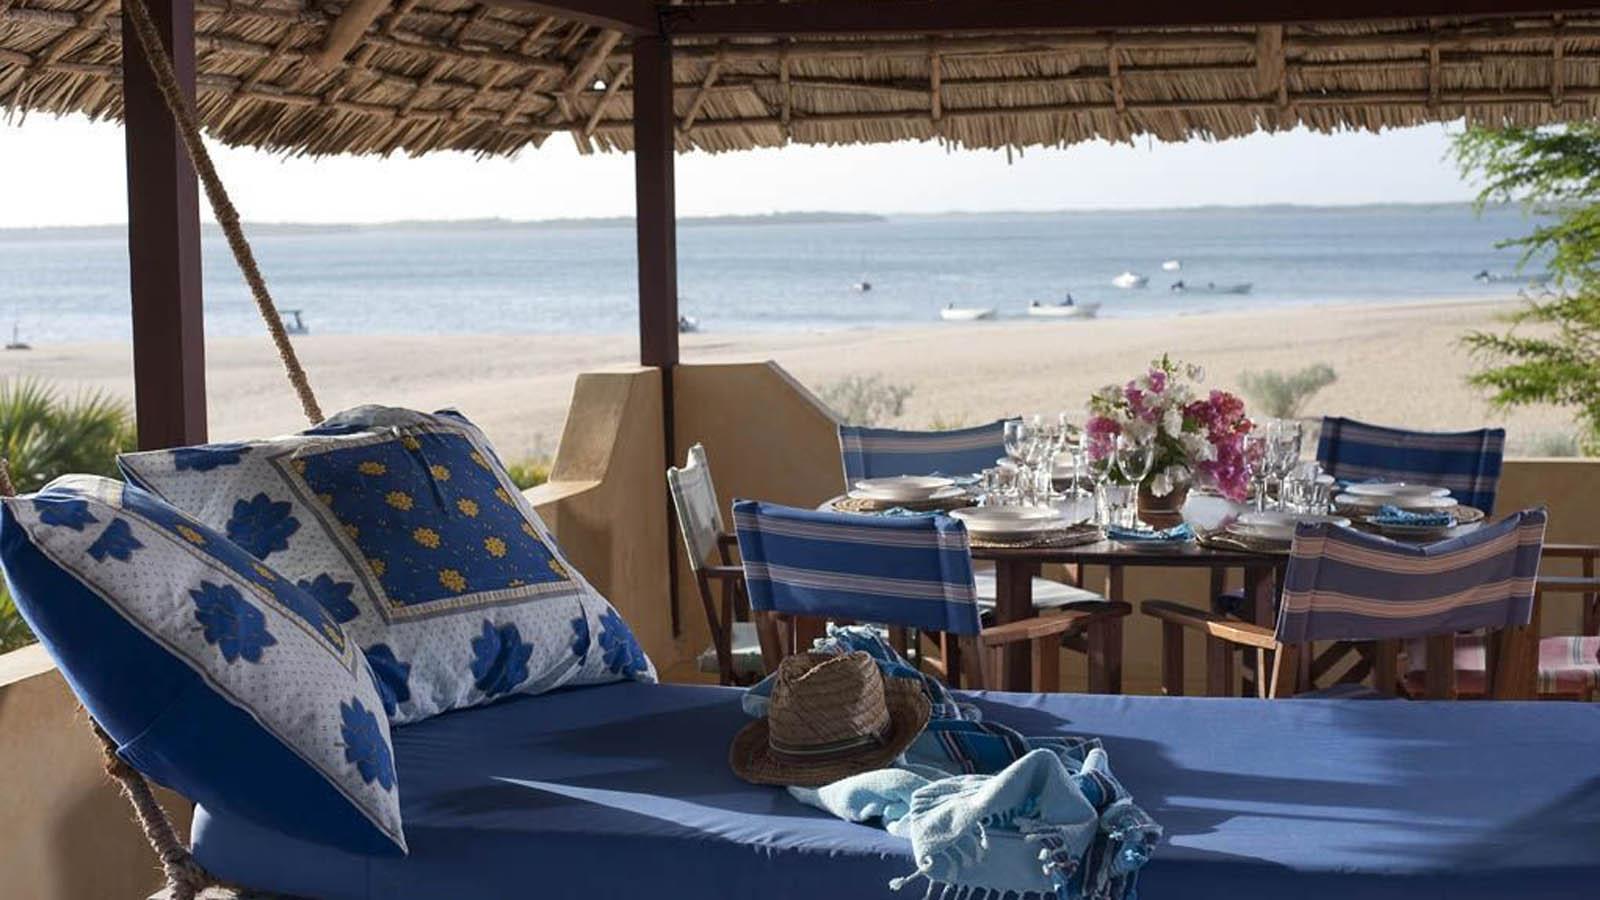 Kizingo beach resort